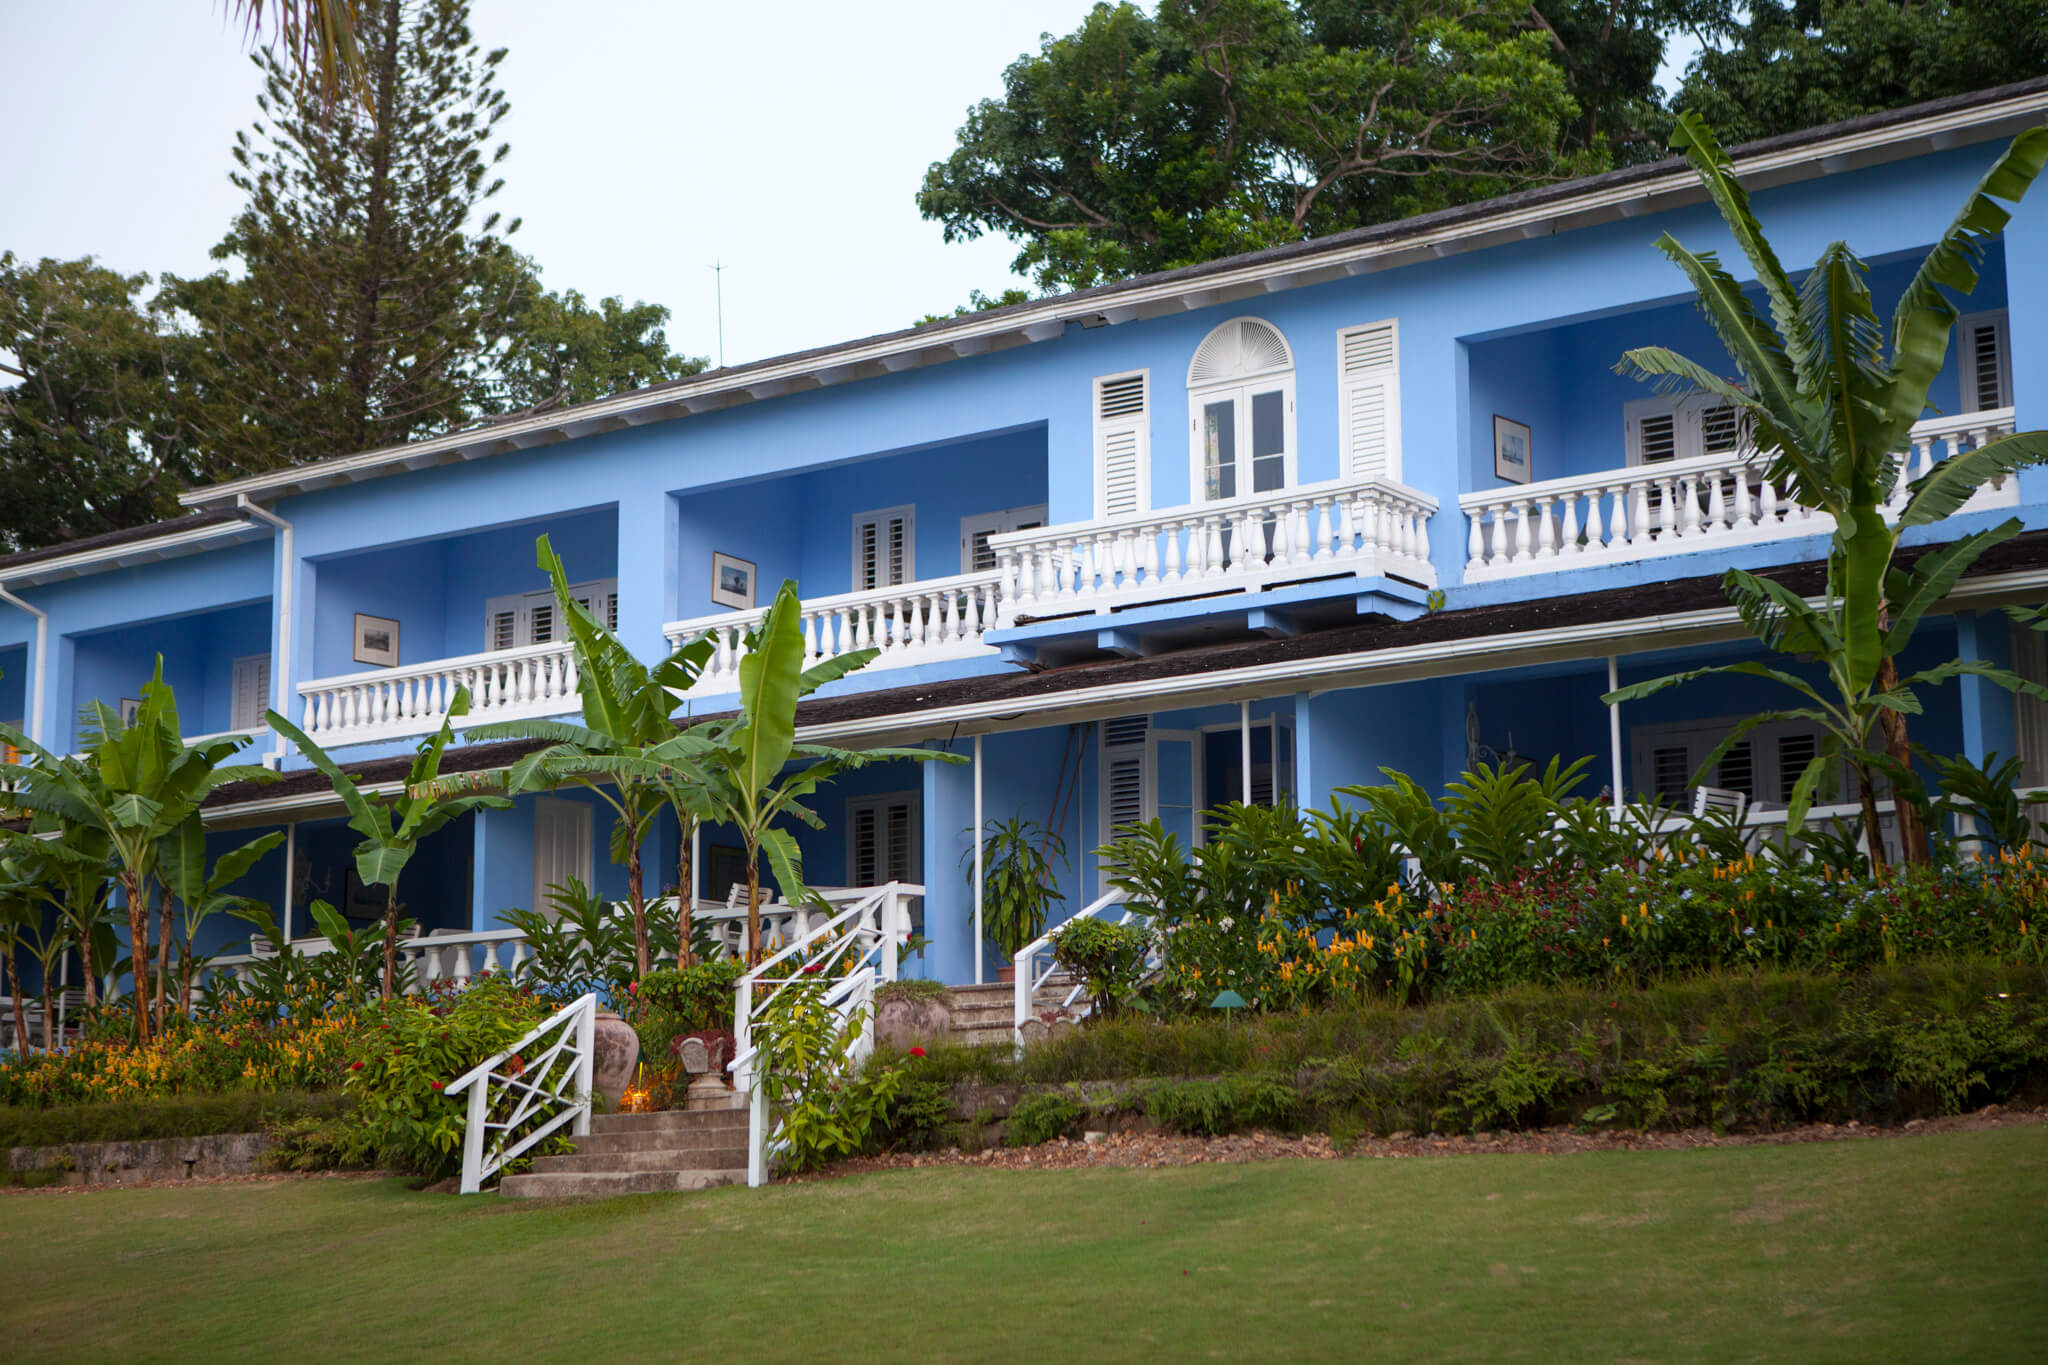 jamaica-inn-11.jpg